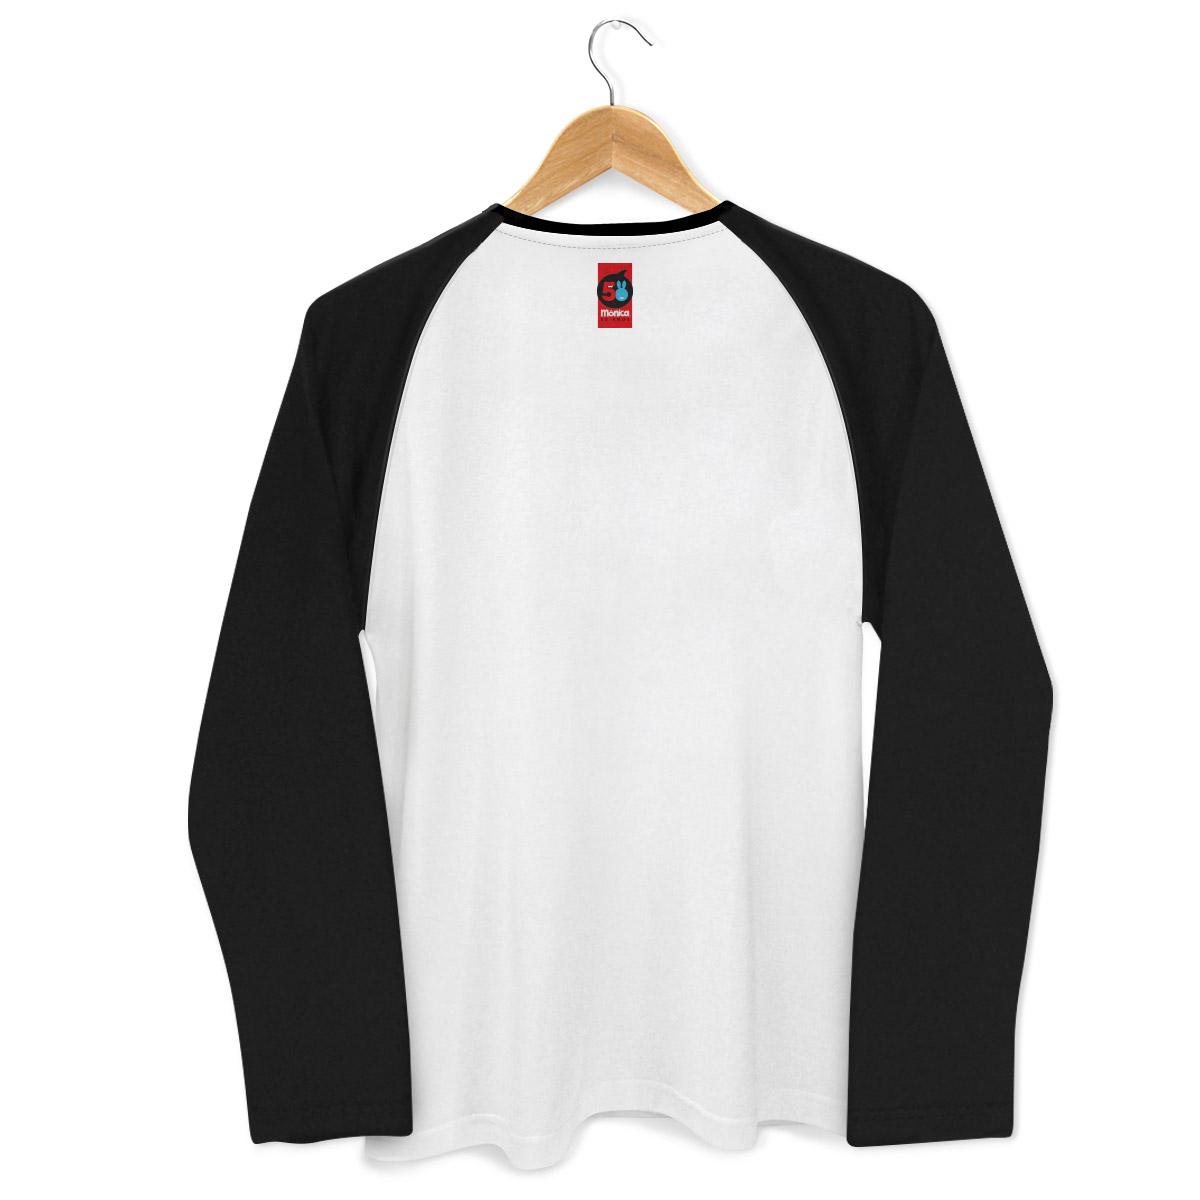 Camiseta Raglan Masculina Turma da M�nica 50 Anos Evolu��o Modelo 9